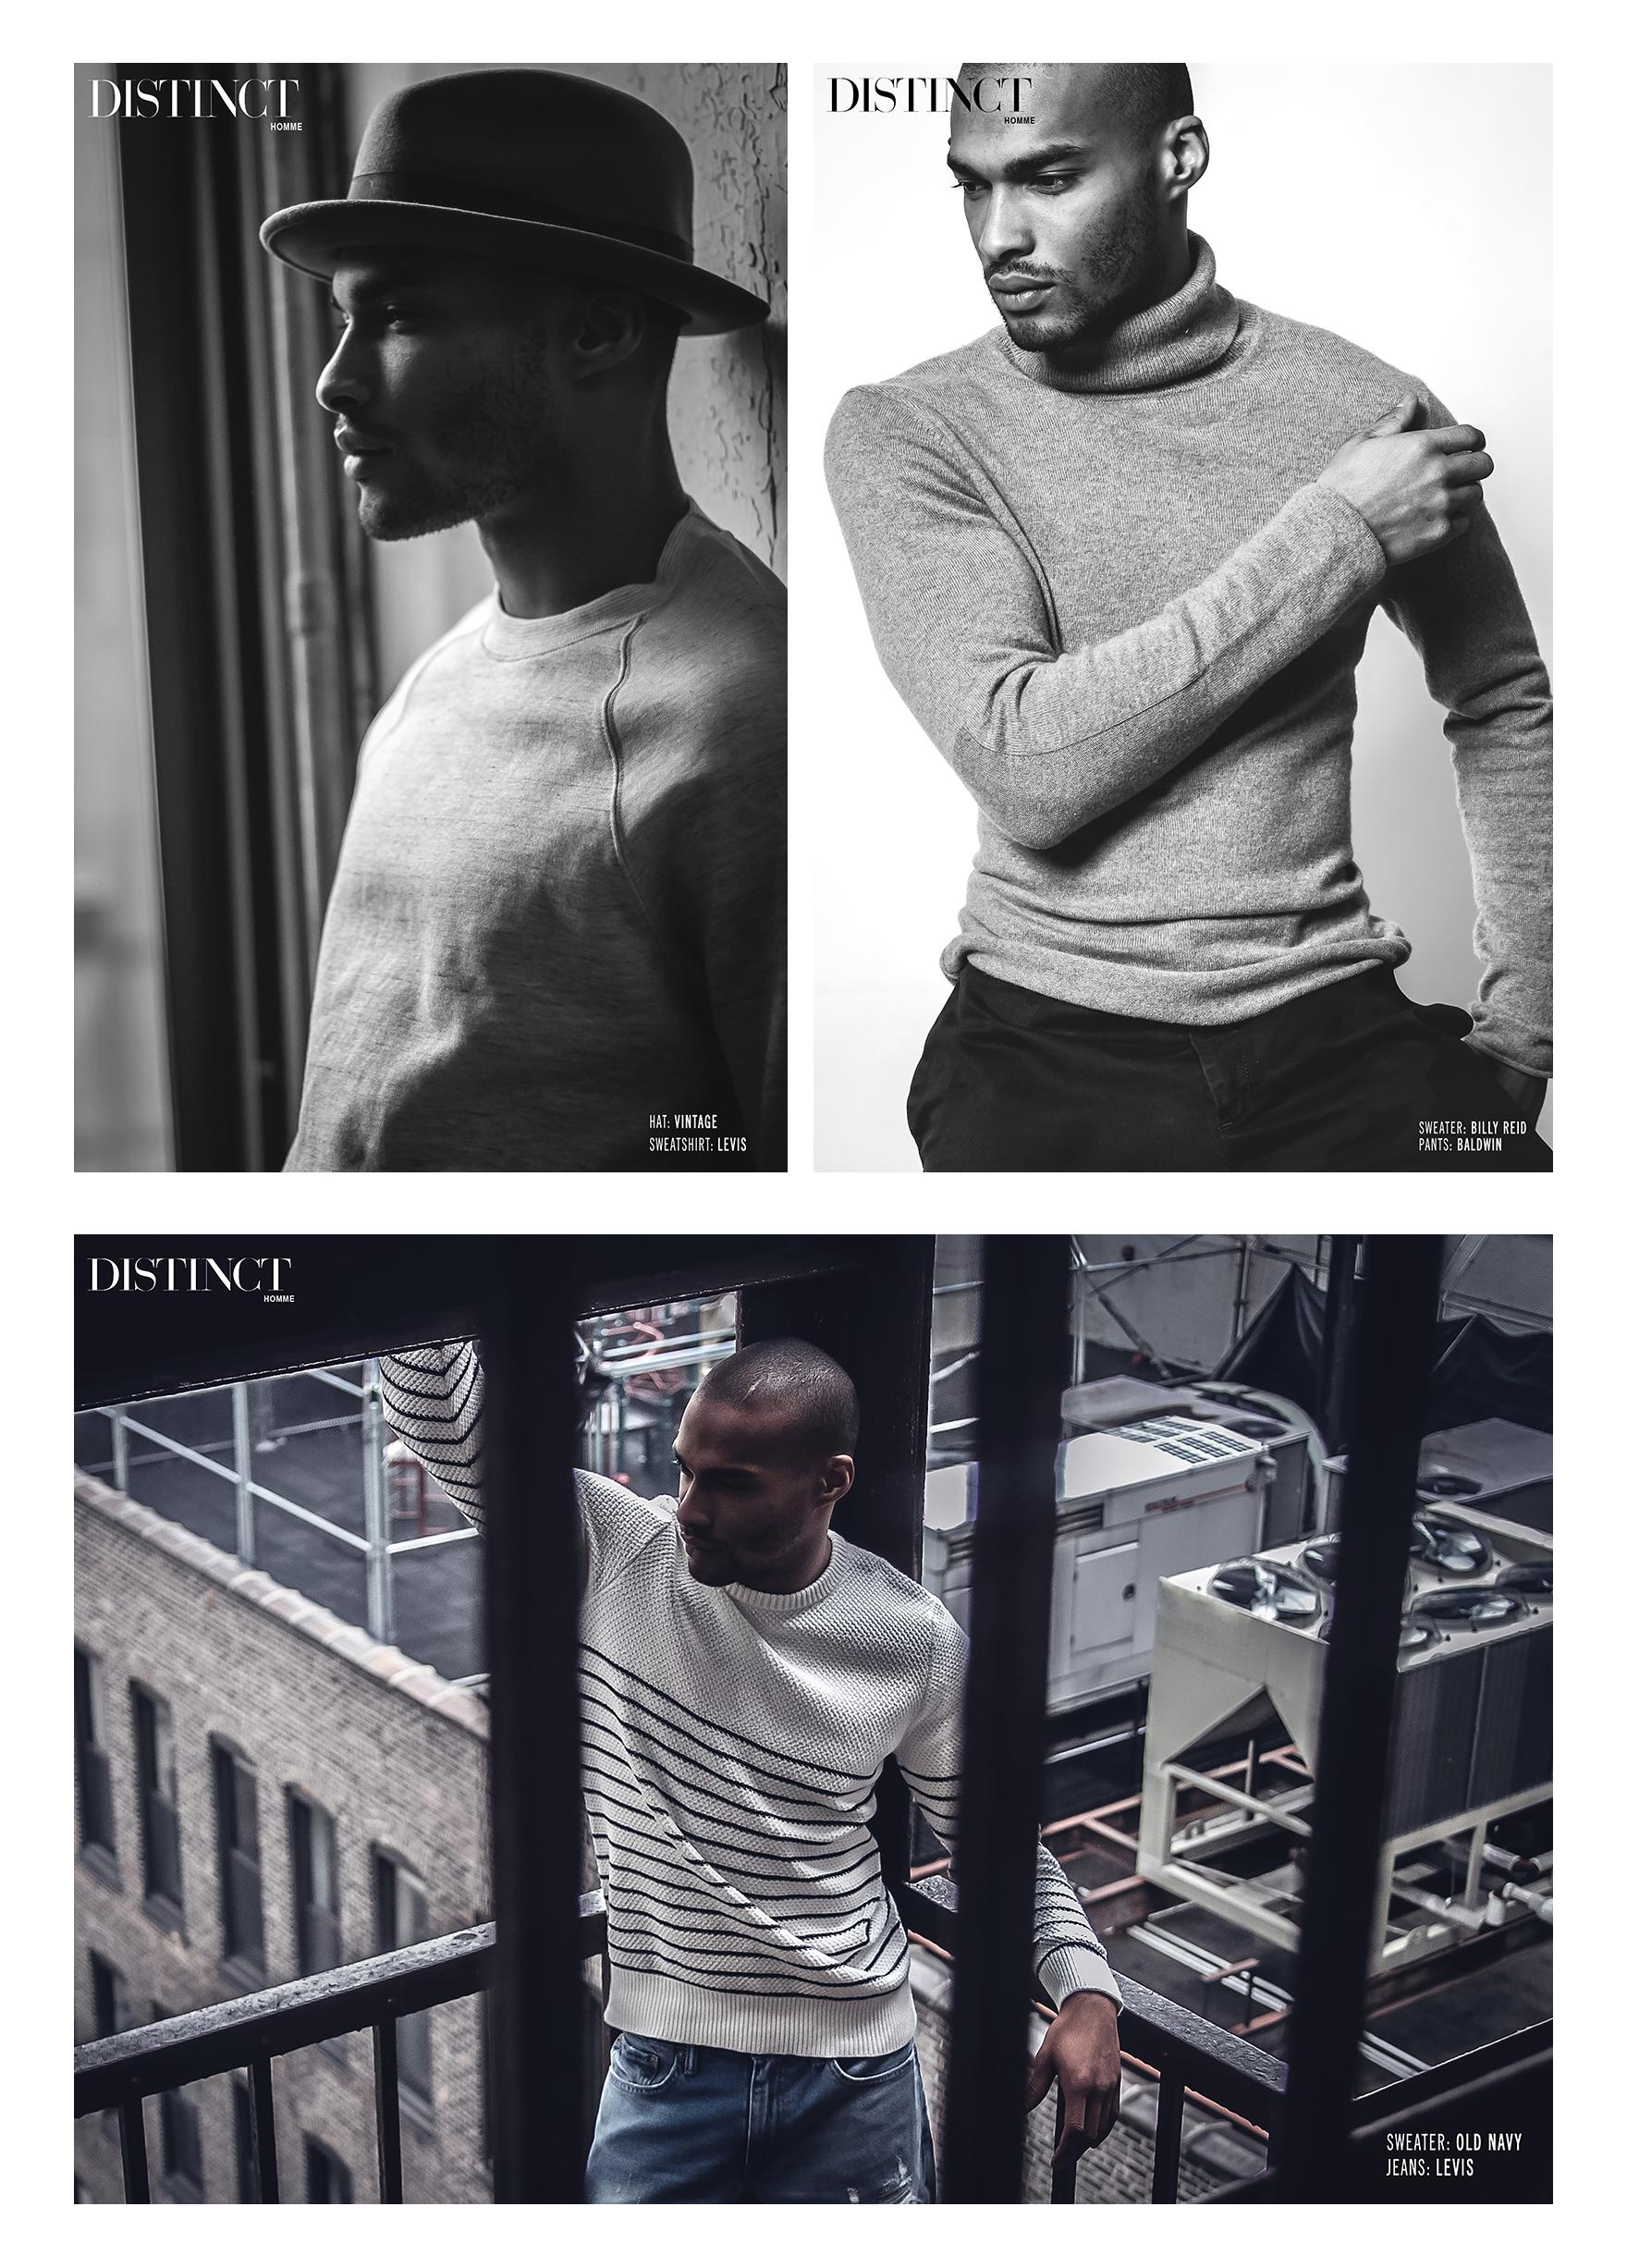 Distinct Homme Magazine